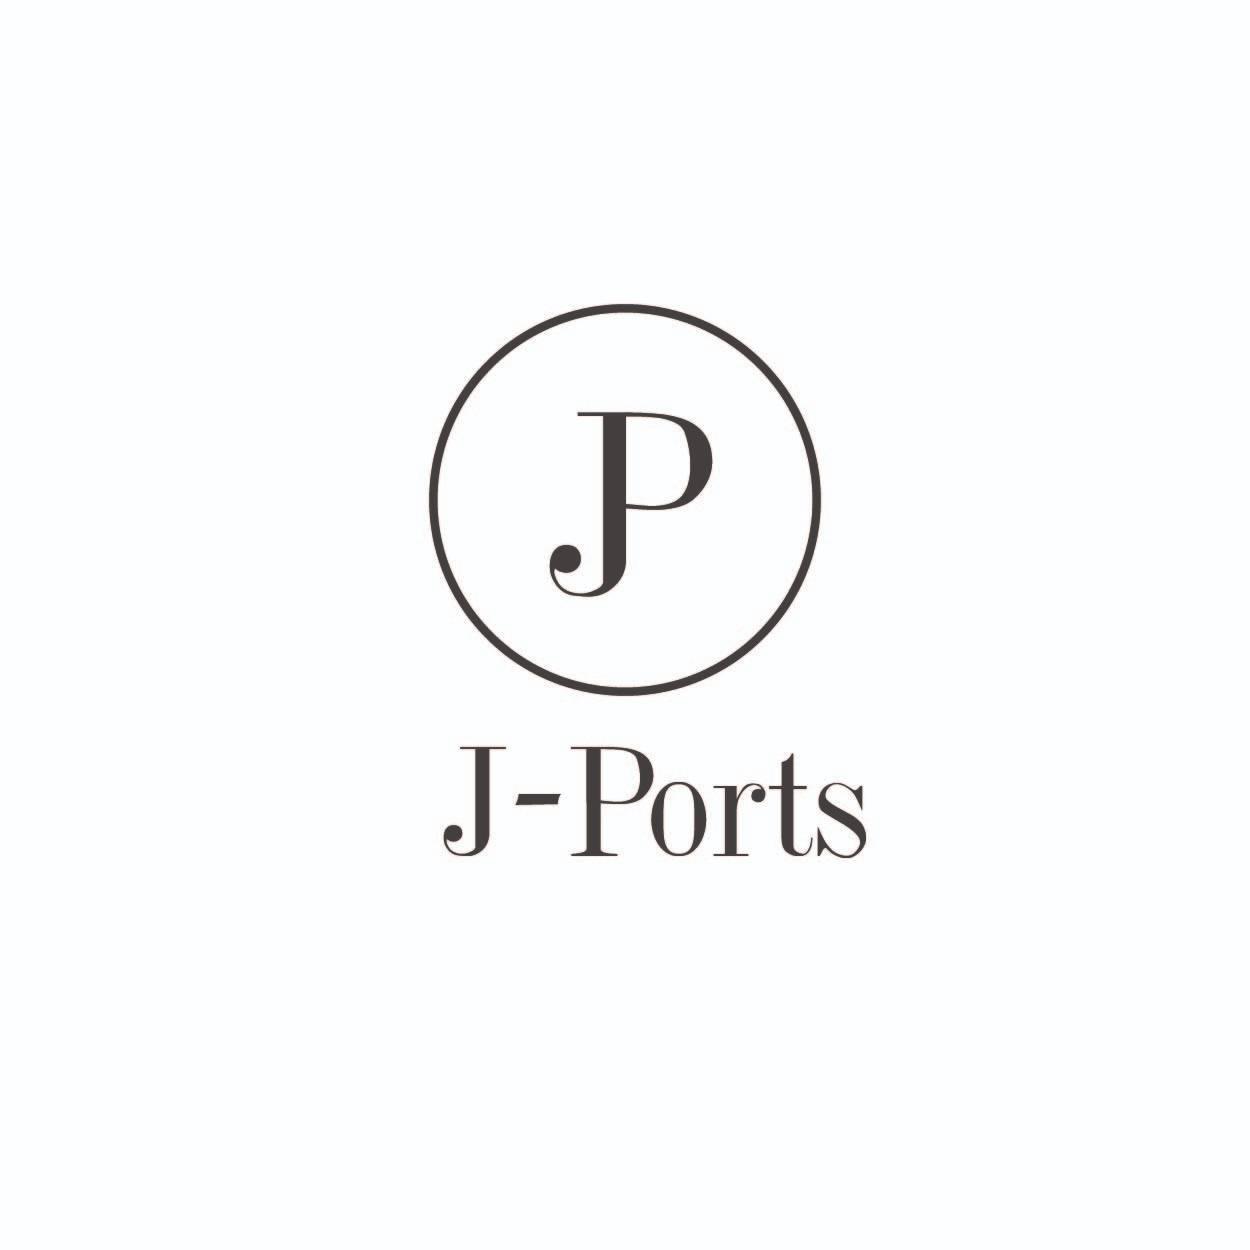 J-Ports K.K